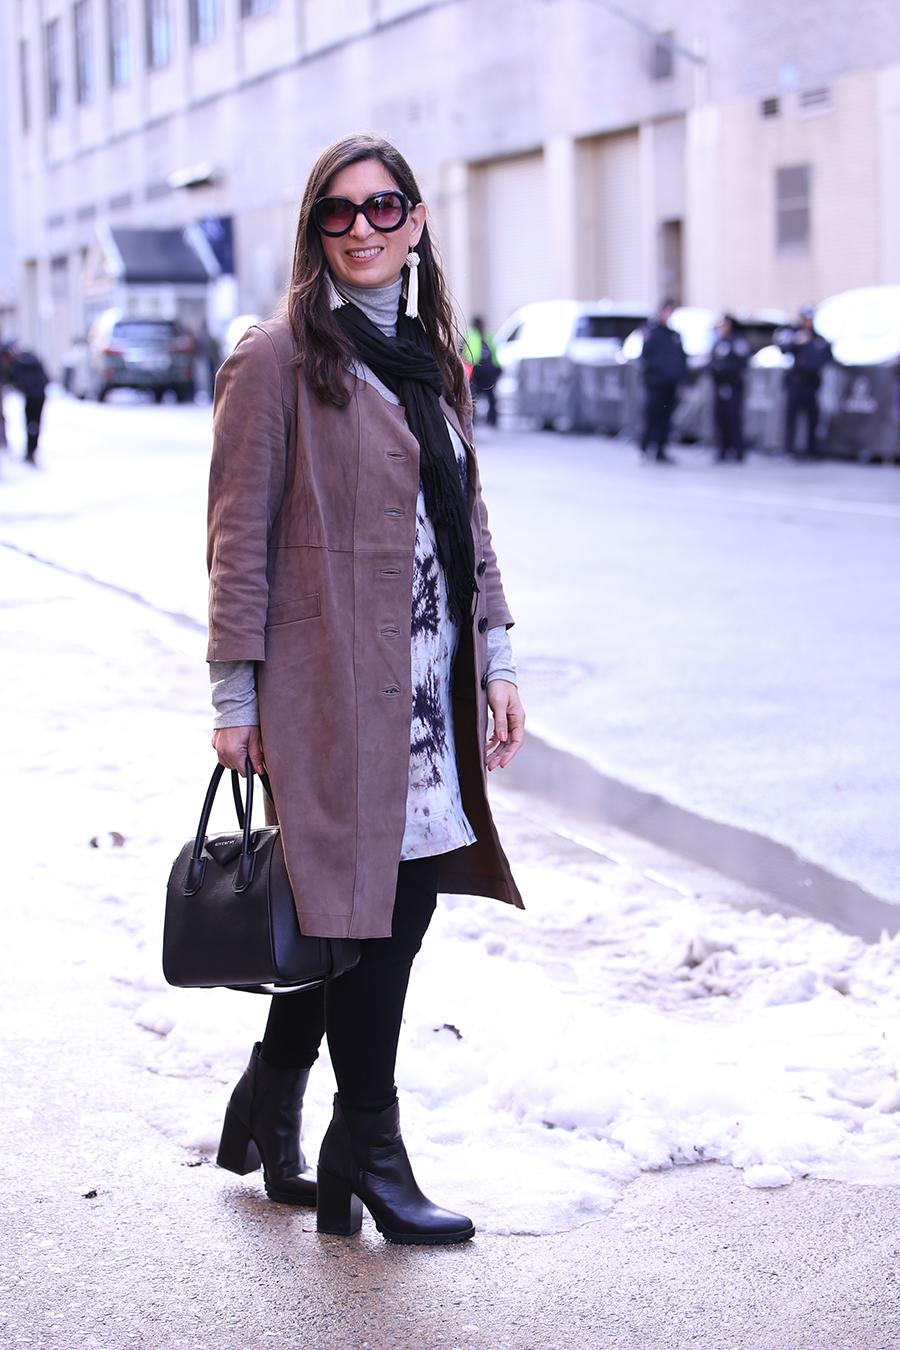 thacker nyc at new york fashion week